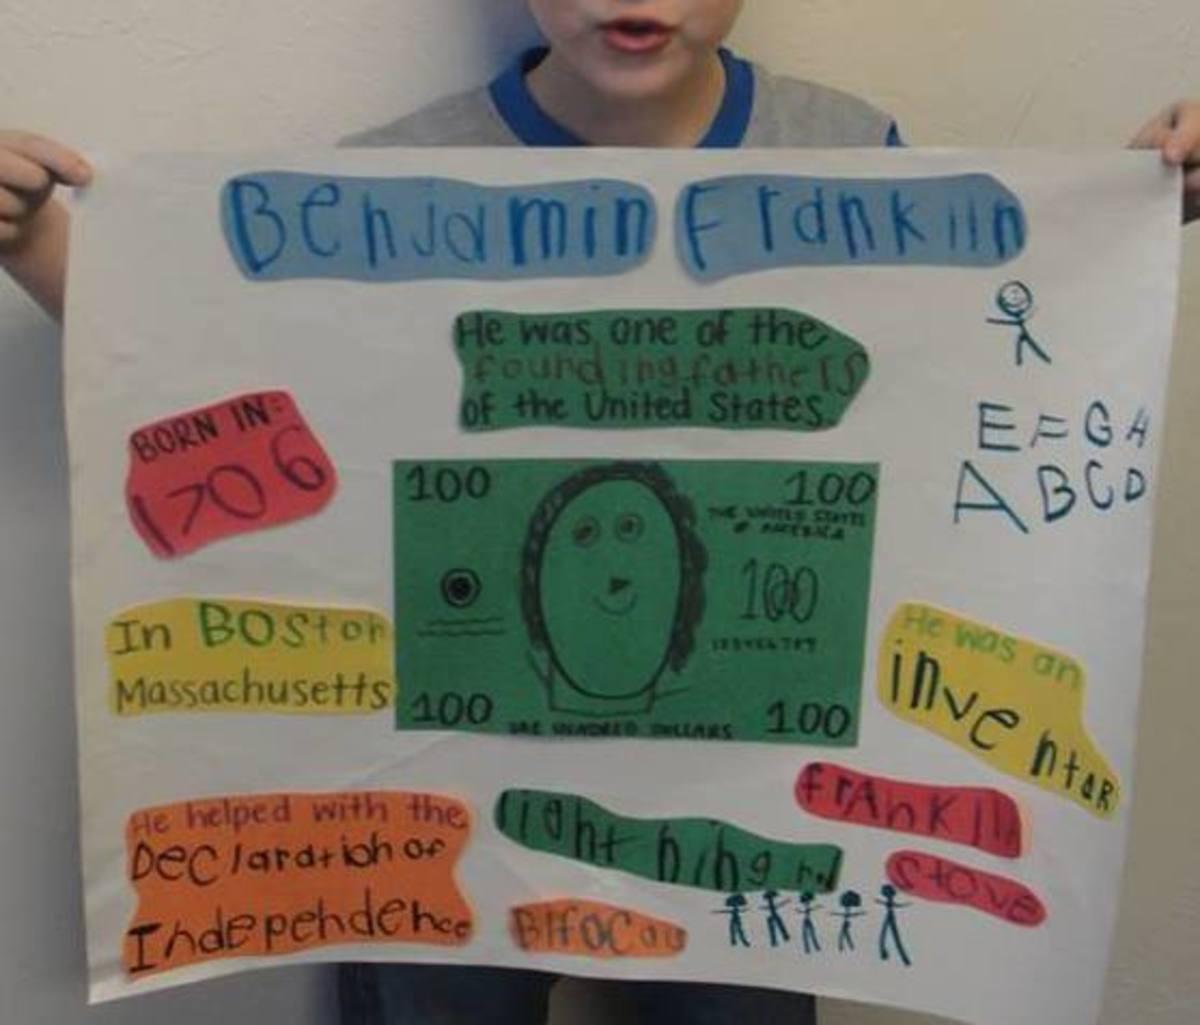 Student presentation on Benjamin Franklin